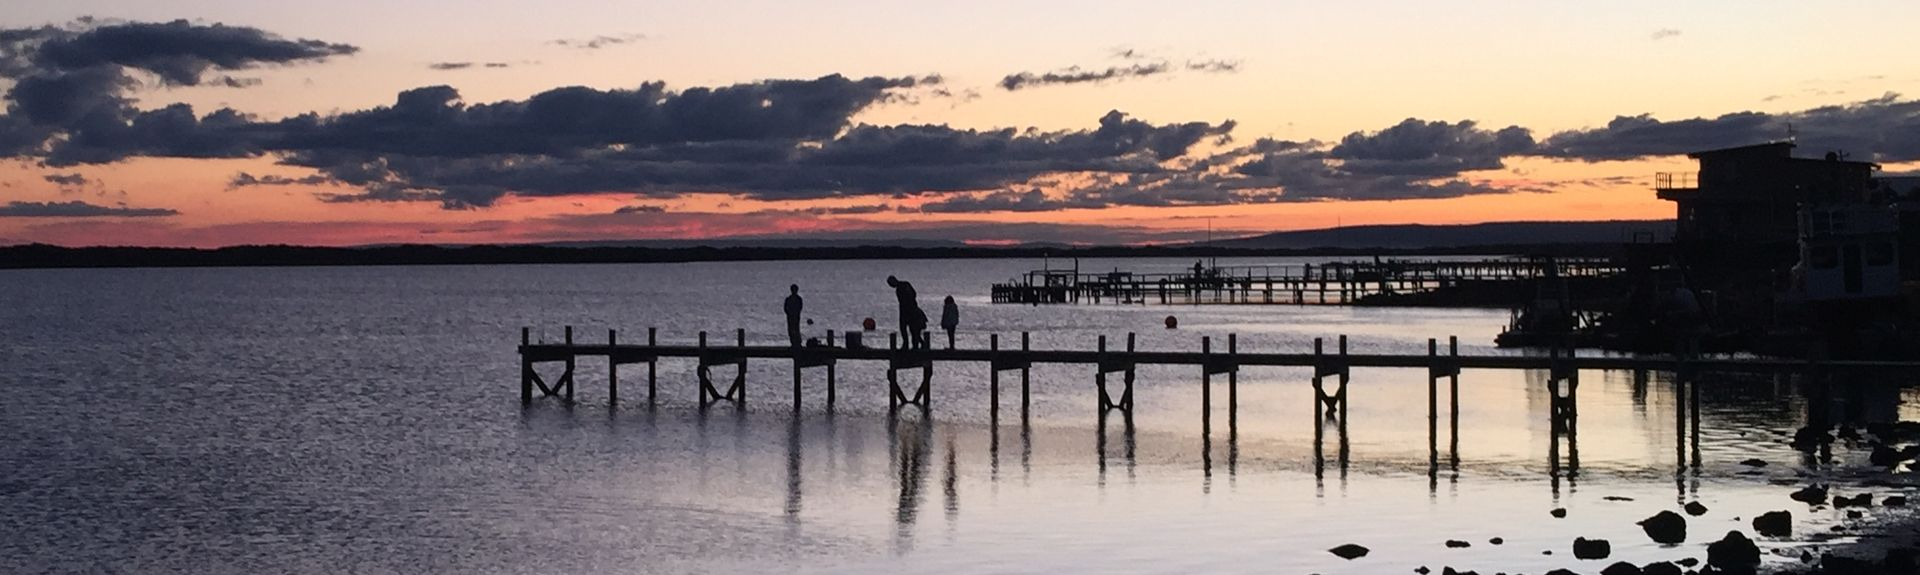 Goolwa SA, Australia